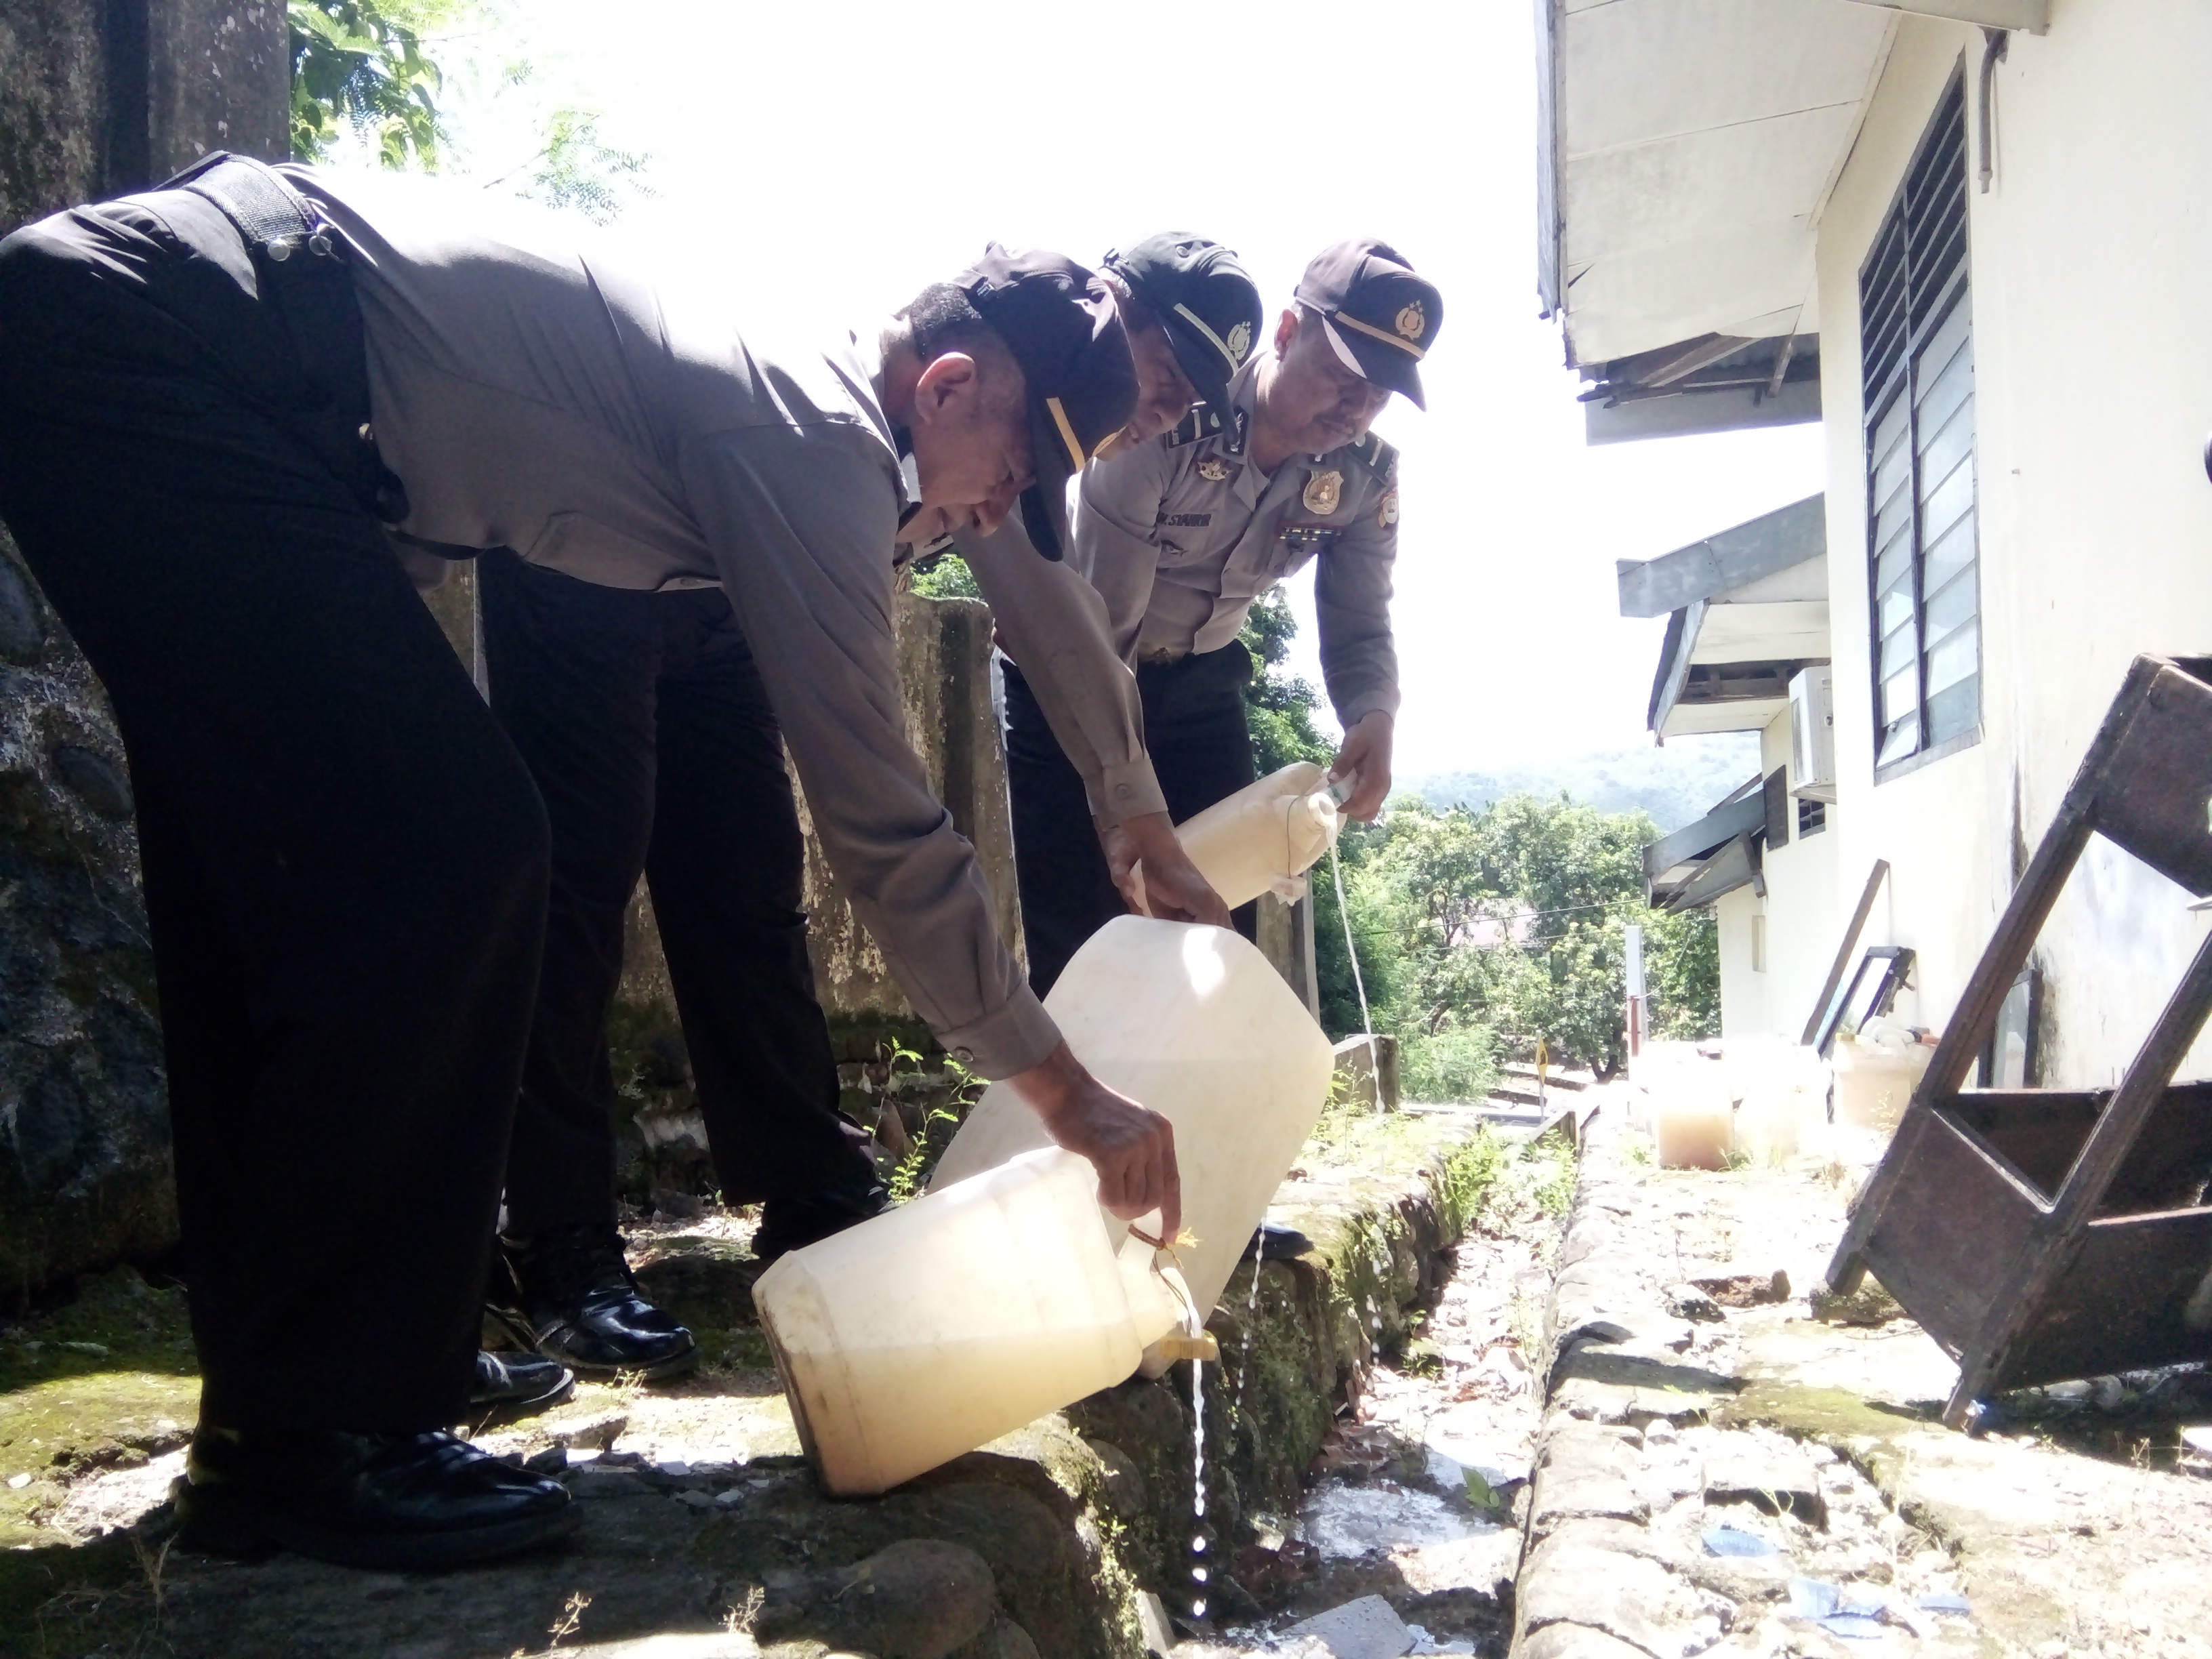 Polsek Bacukiki Parepare Musnahkan Ratusan Liter Ballo